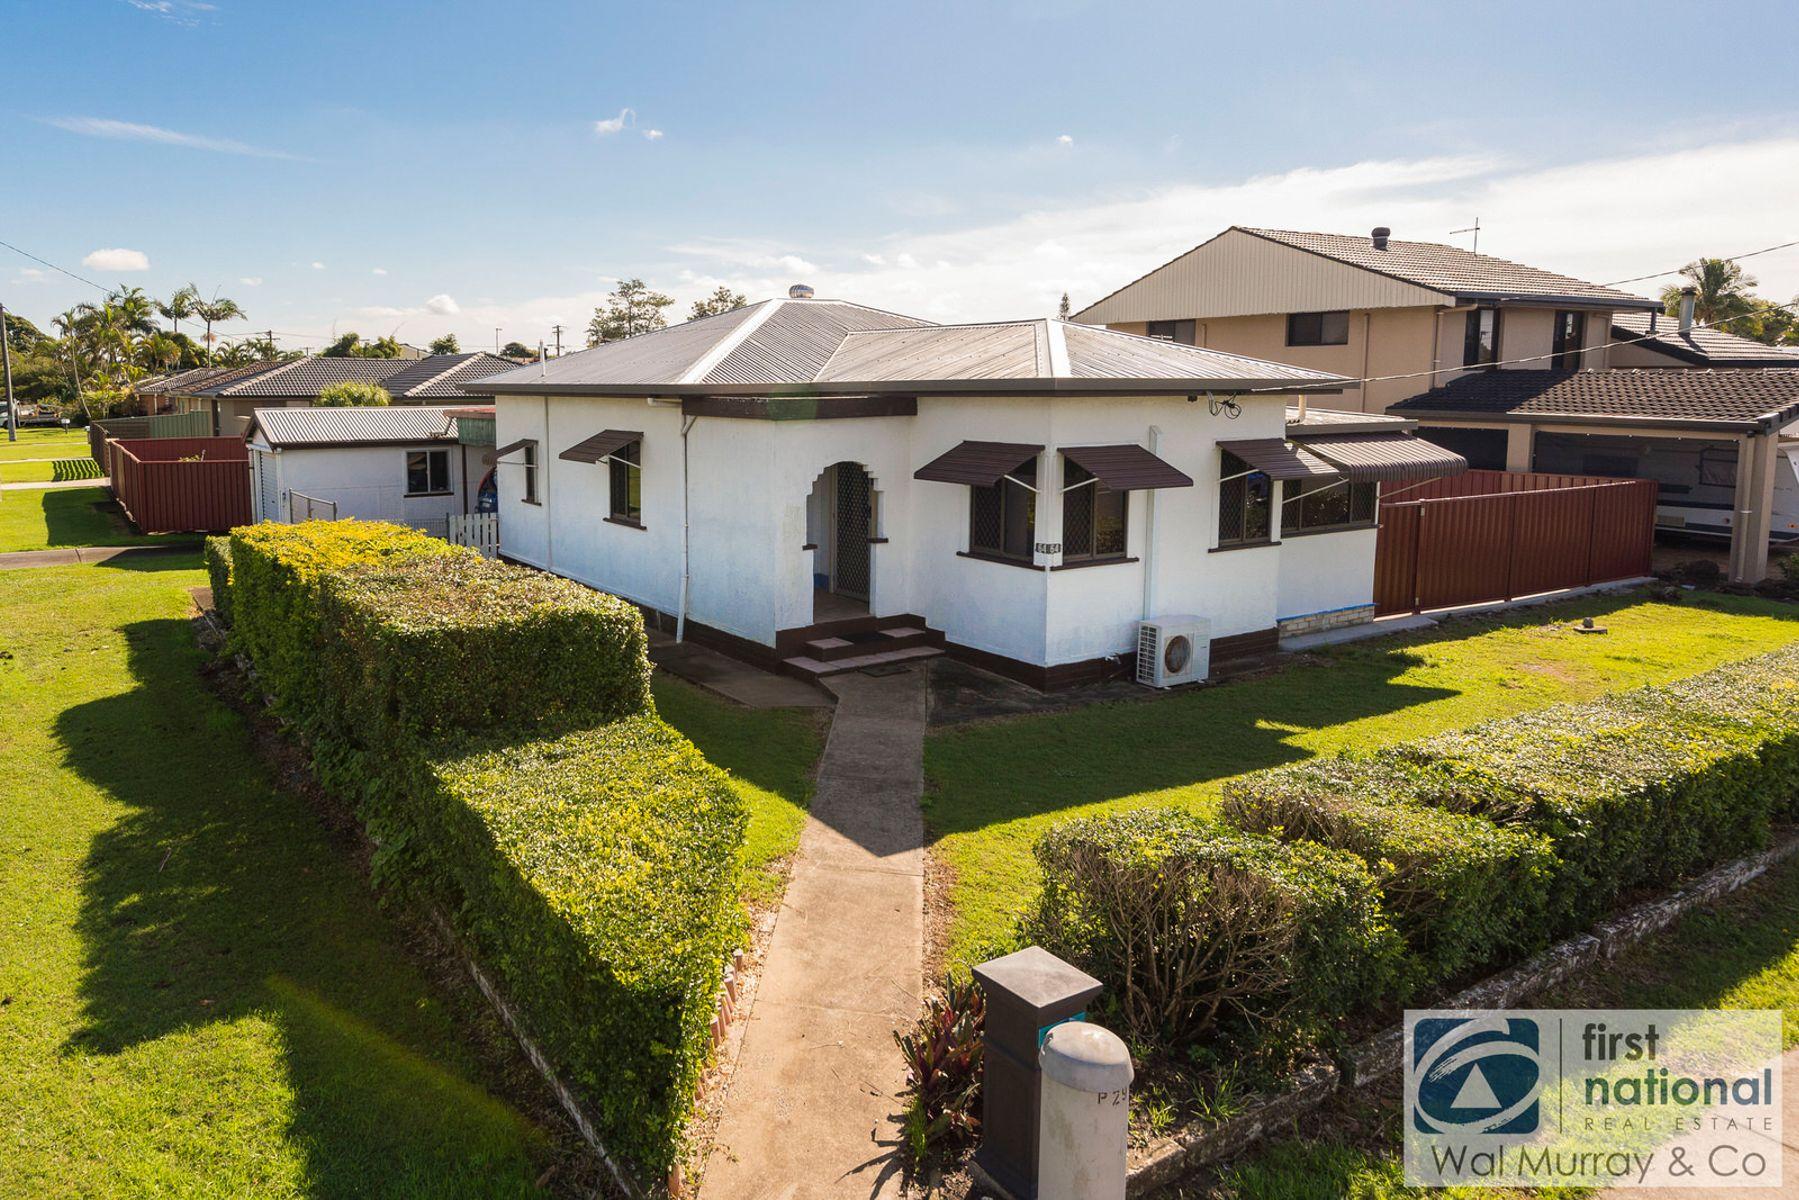 64 Kerr St Ballina Nsw 2478 Australia House For Sale